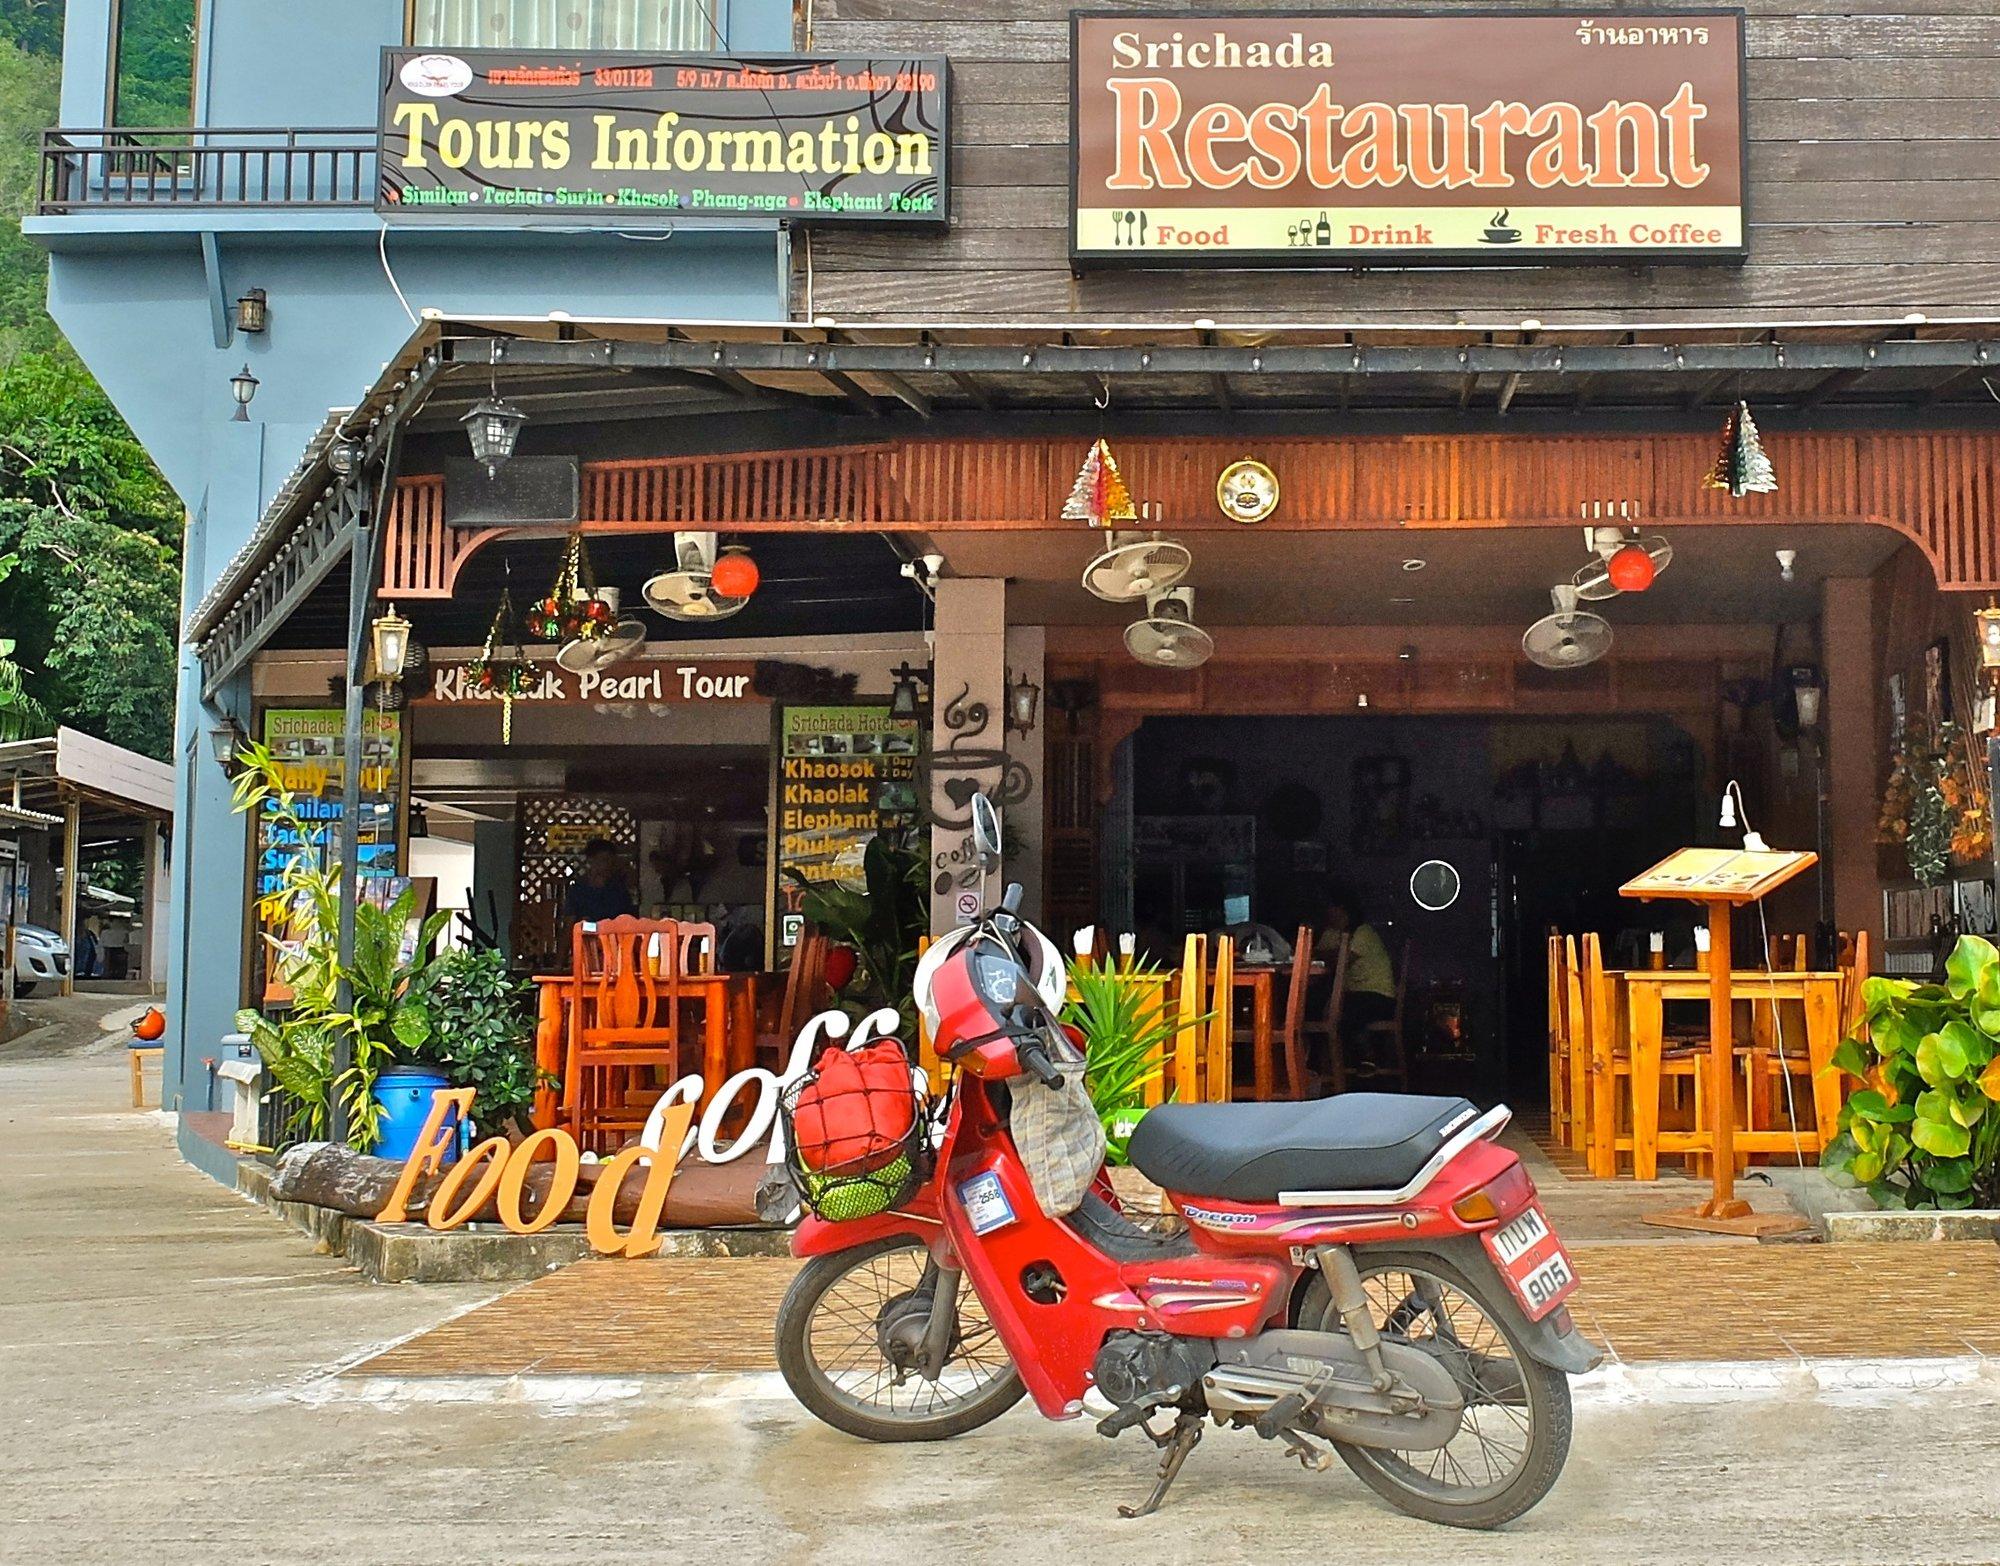 Srichada Hotel & Restaurant.jpg